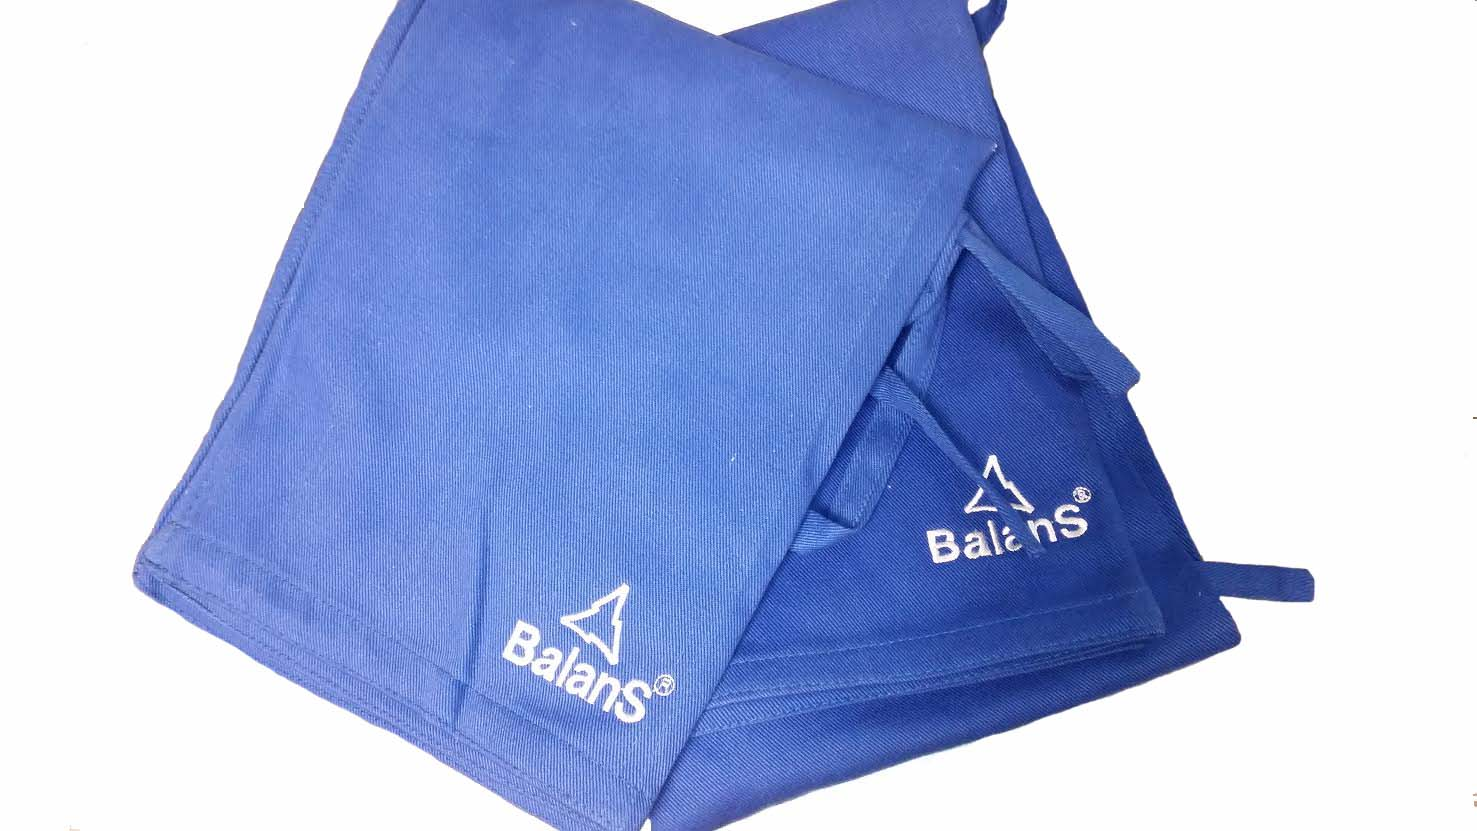 Balans Top Gi Budobroek Blauw